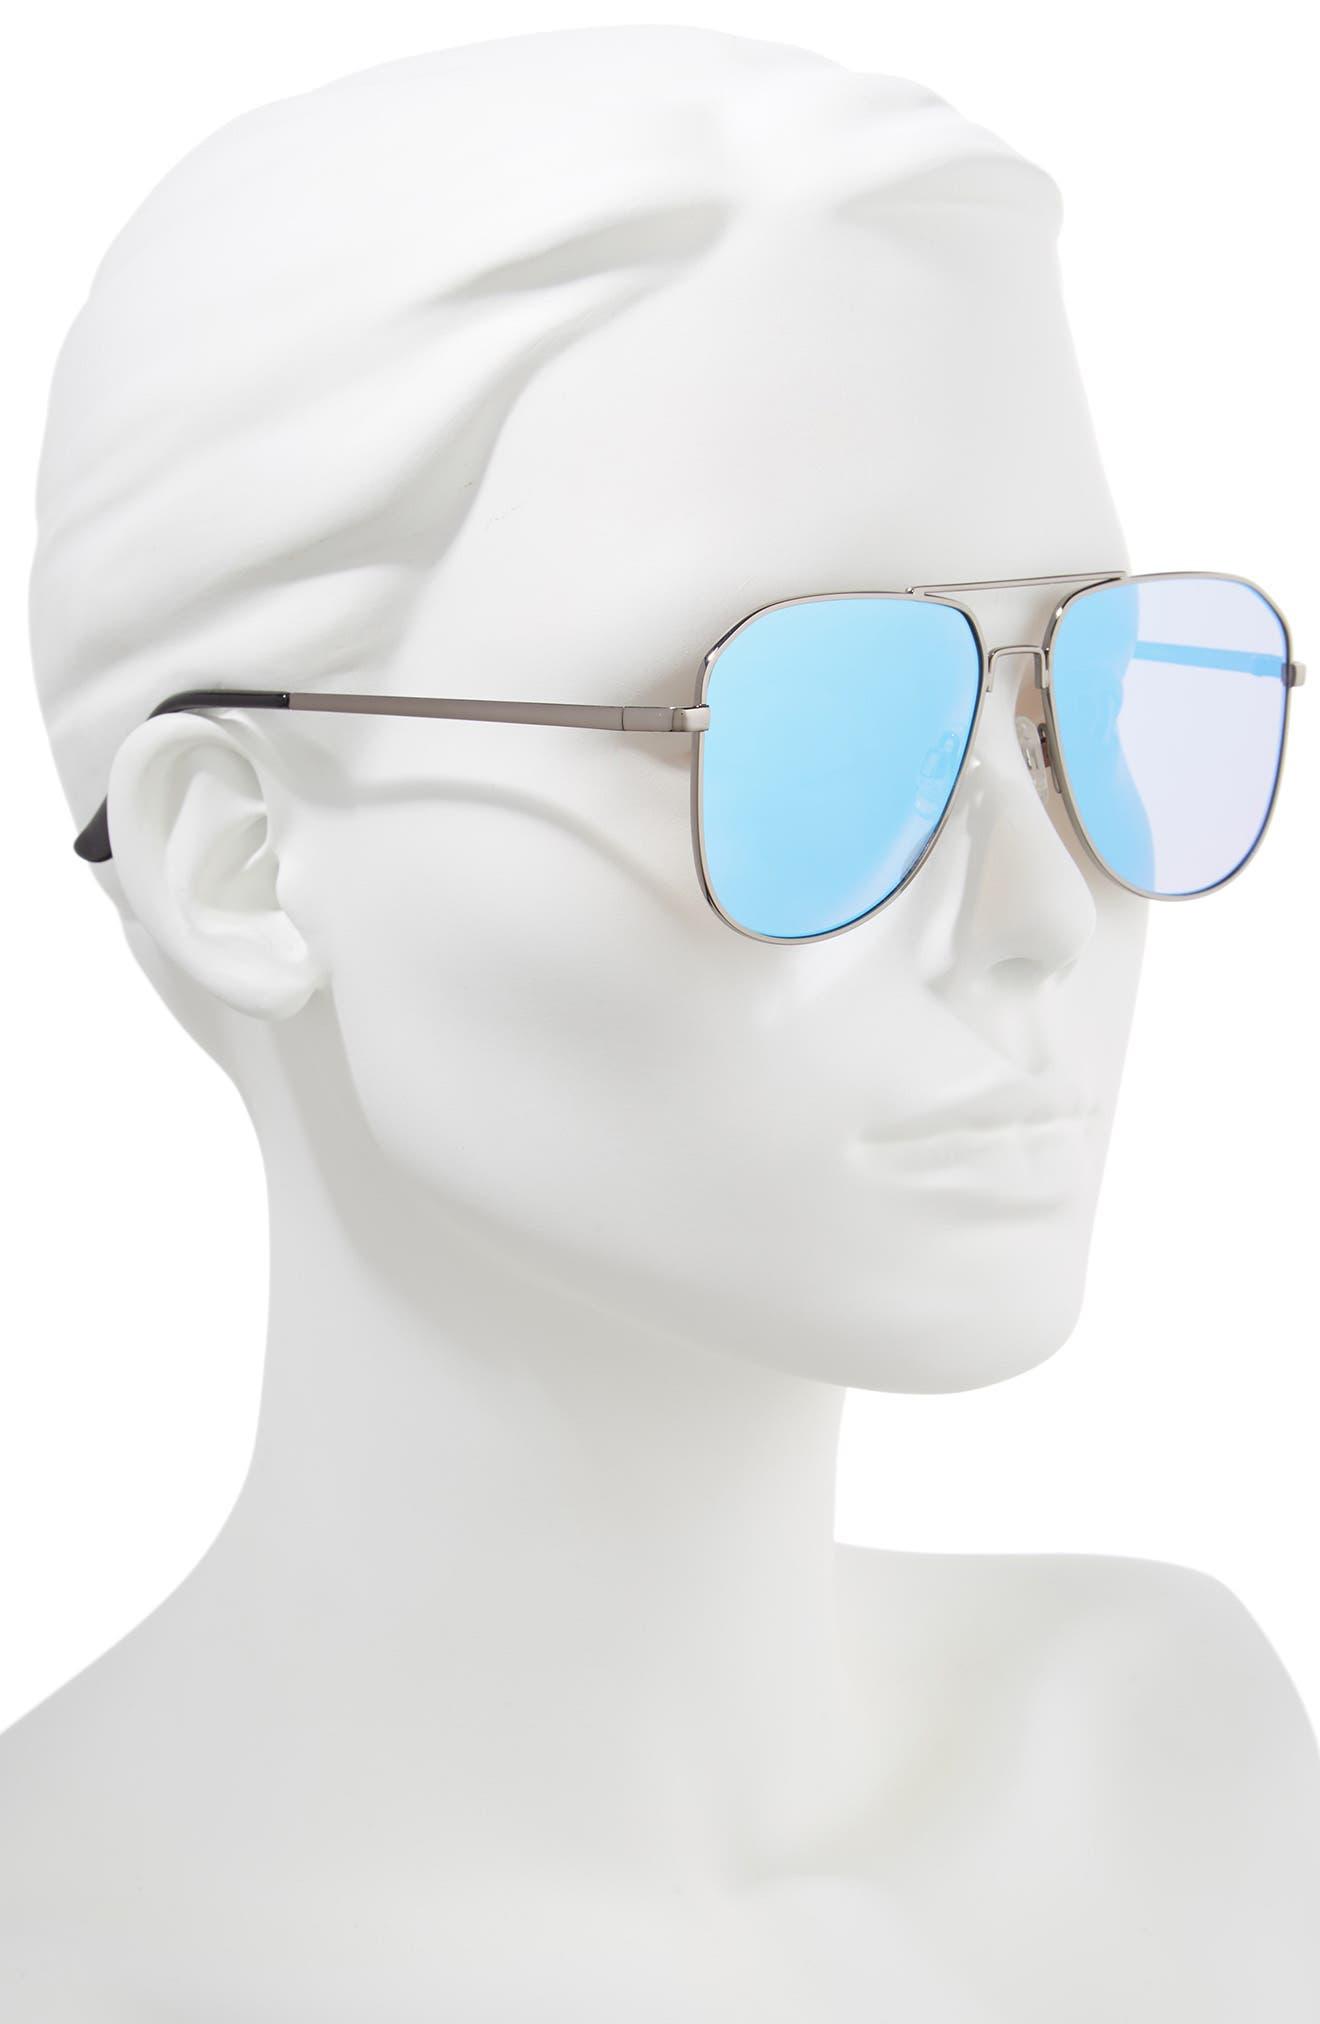 54mm Aviator Sunglasses,                             Alternate thumbnail 2, color,                             040